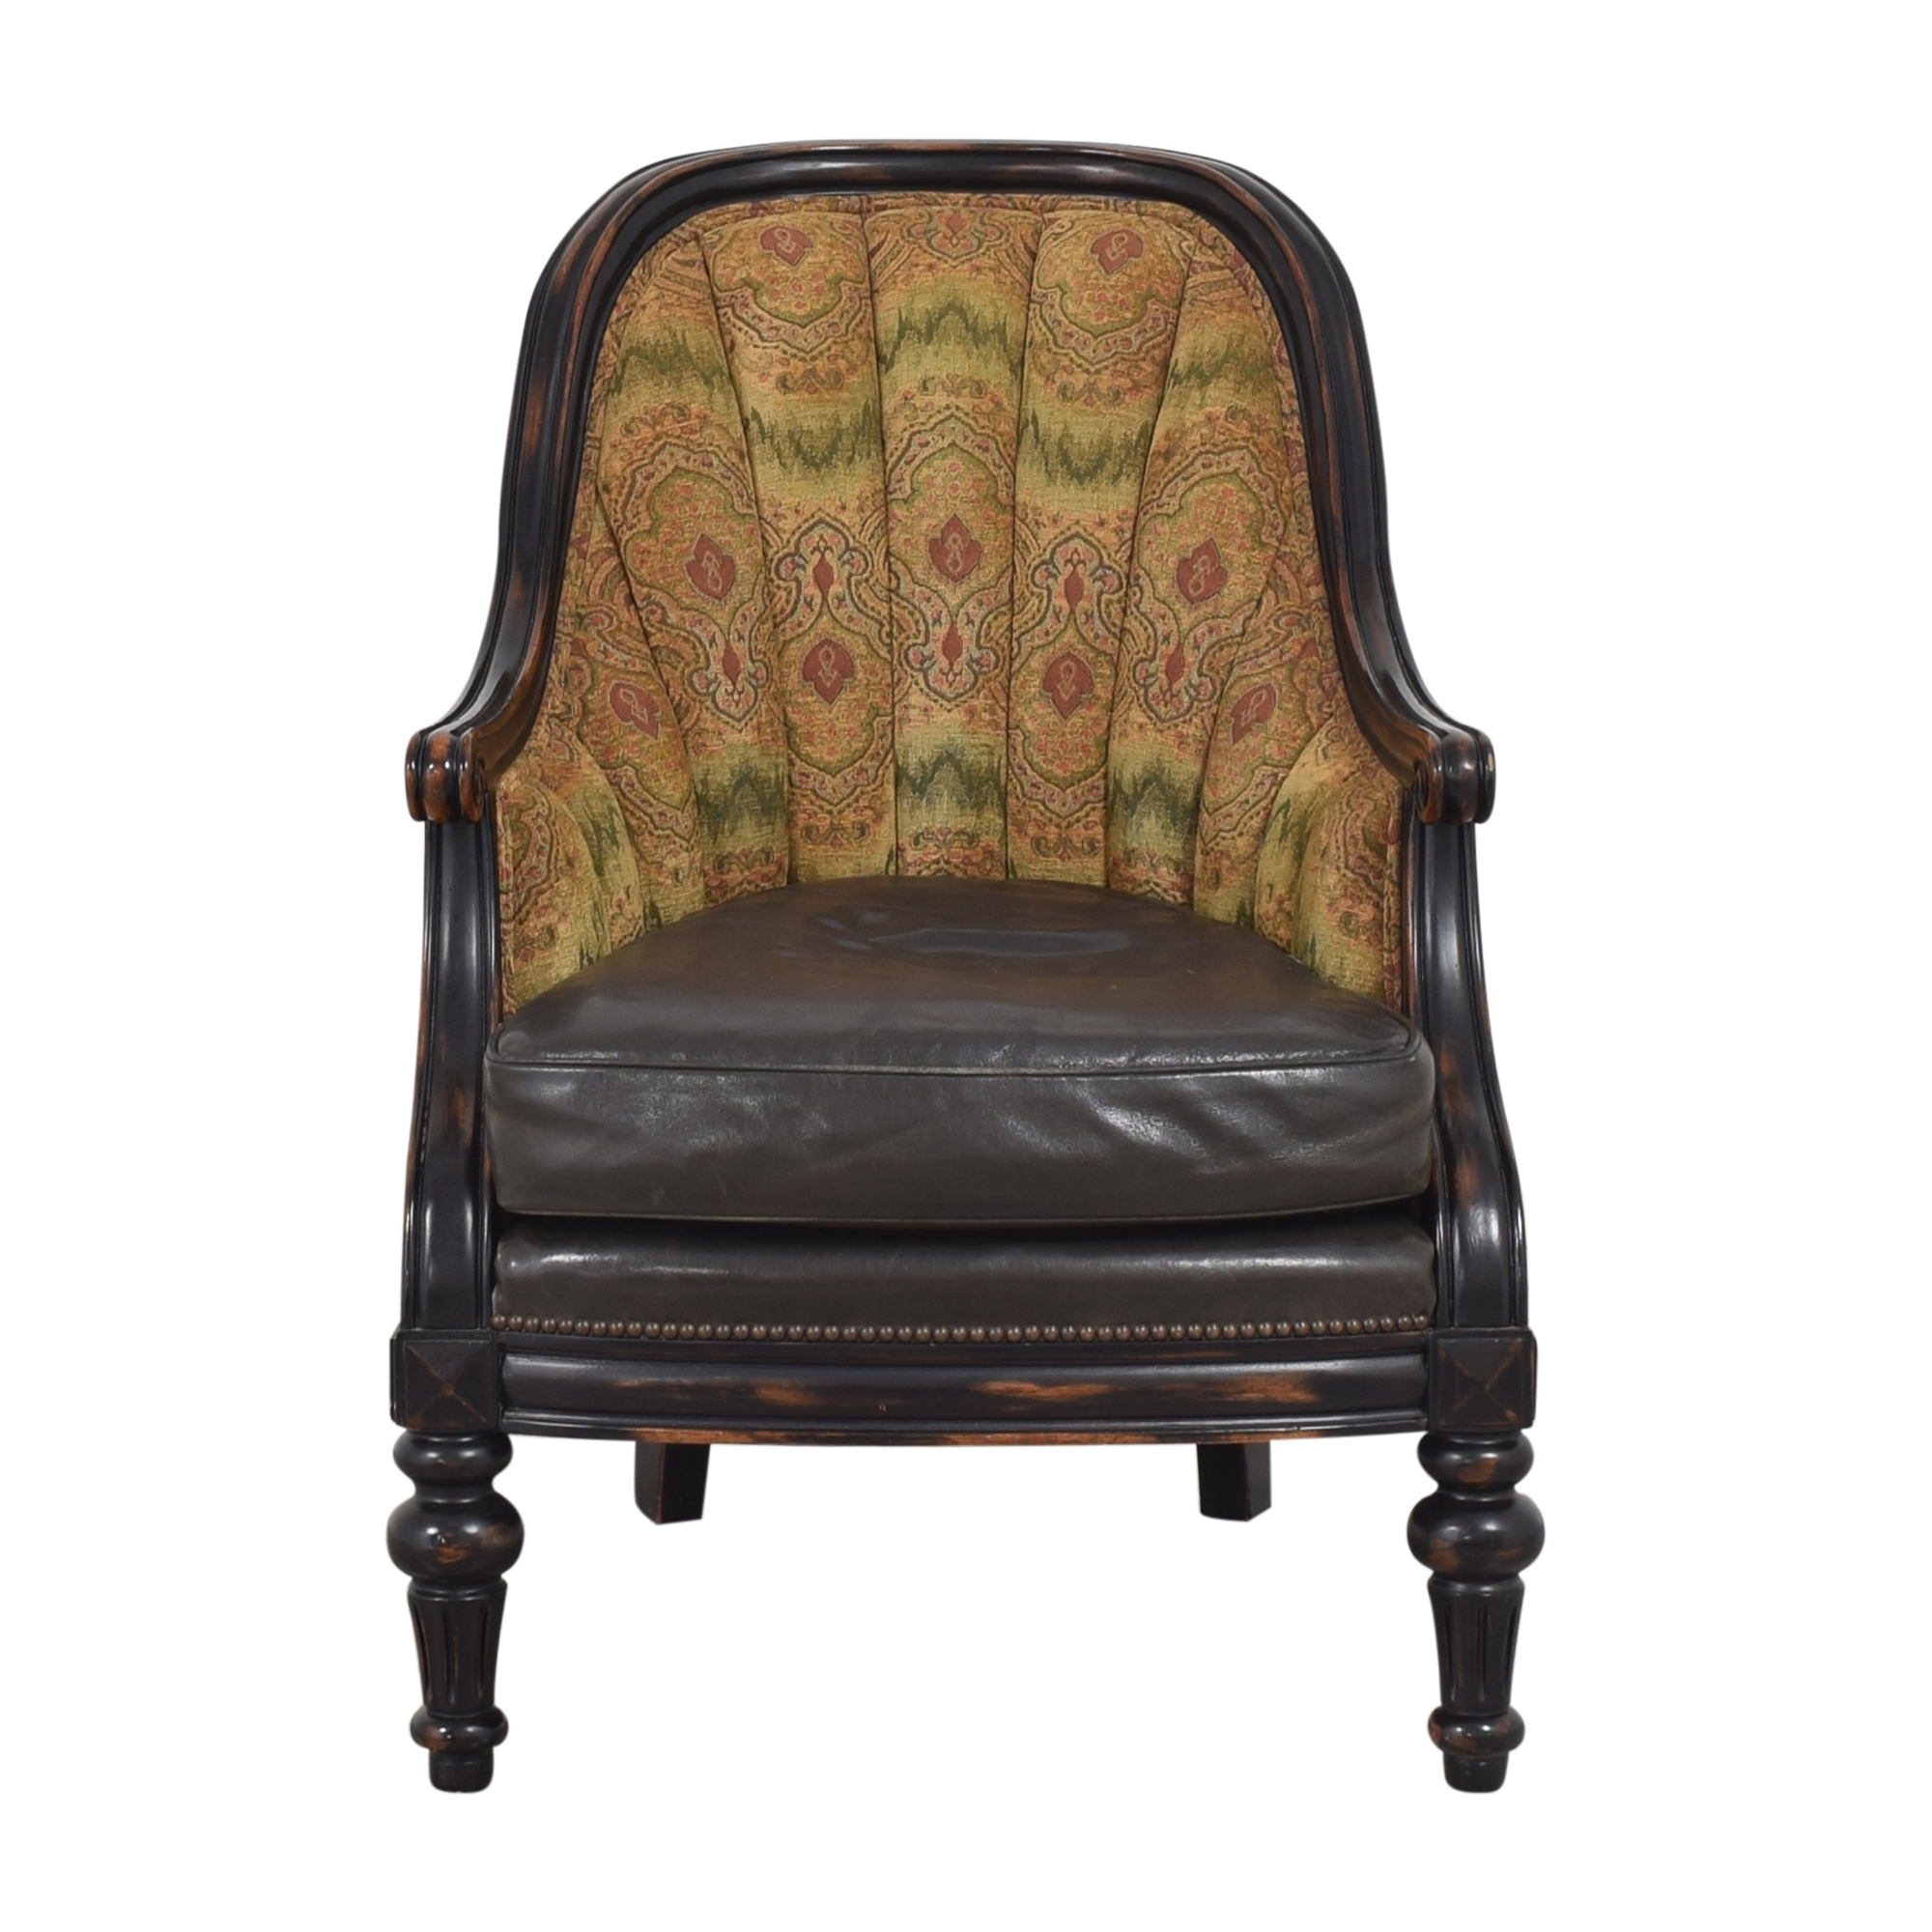 buy Vanguard Craftwork Accent Chair Vanguard Furniture Chairs